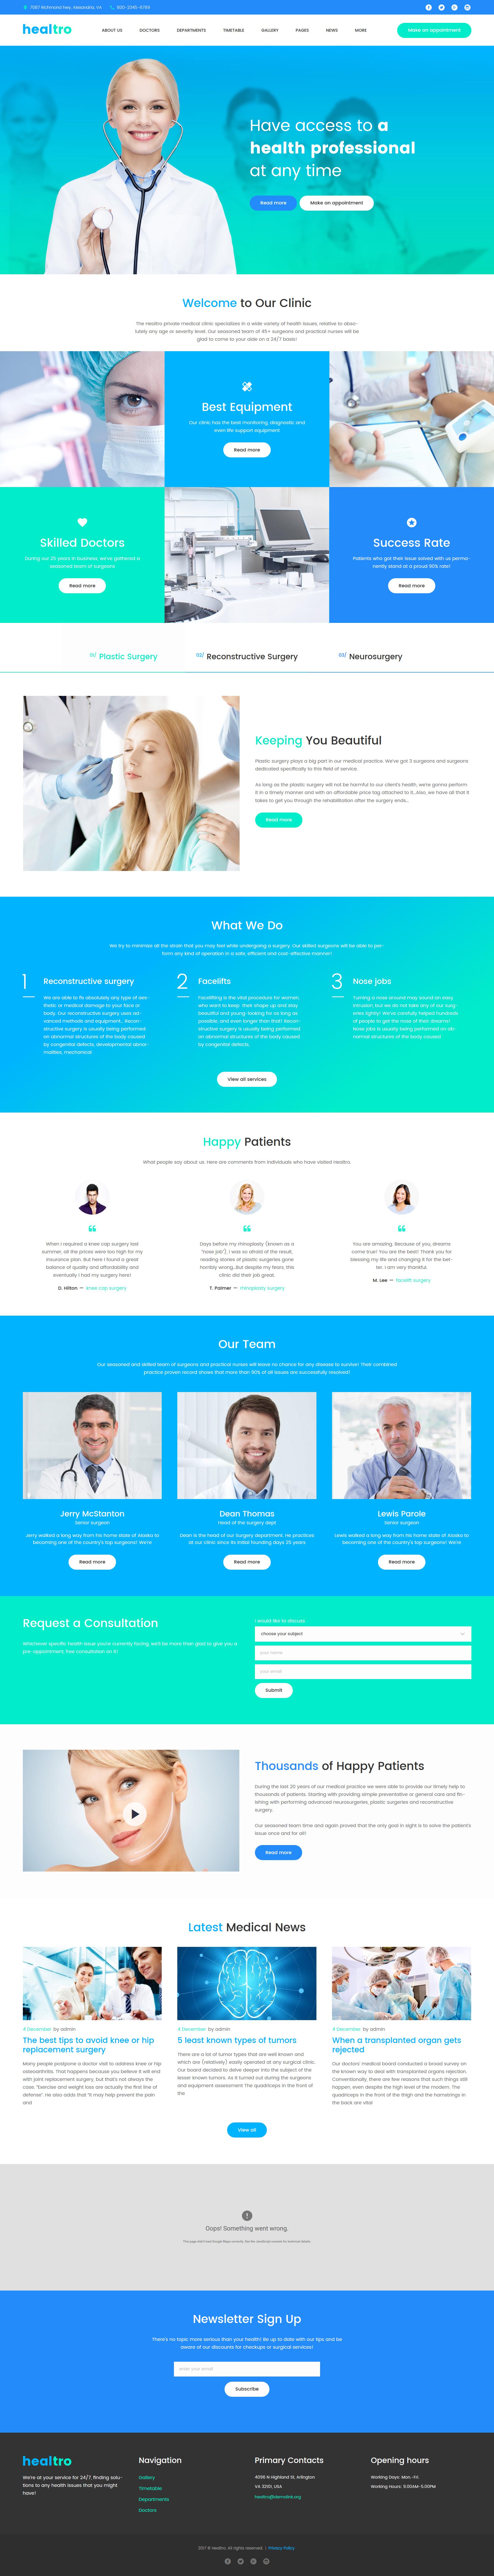 """Healtro - Clinique médicale privée"" thème WordPress adaptatif #58677"